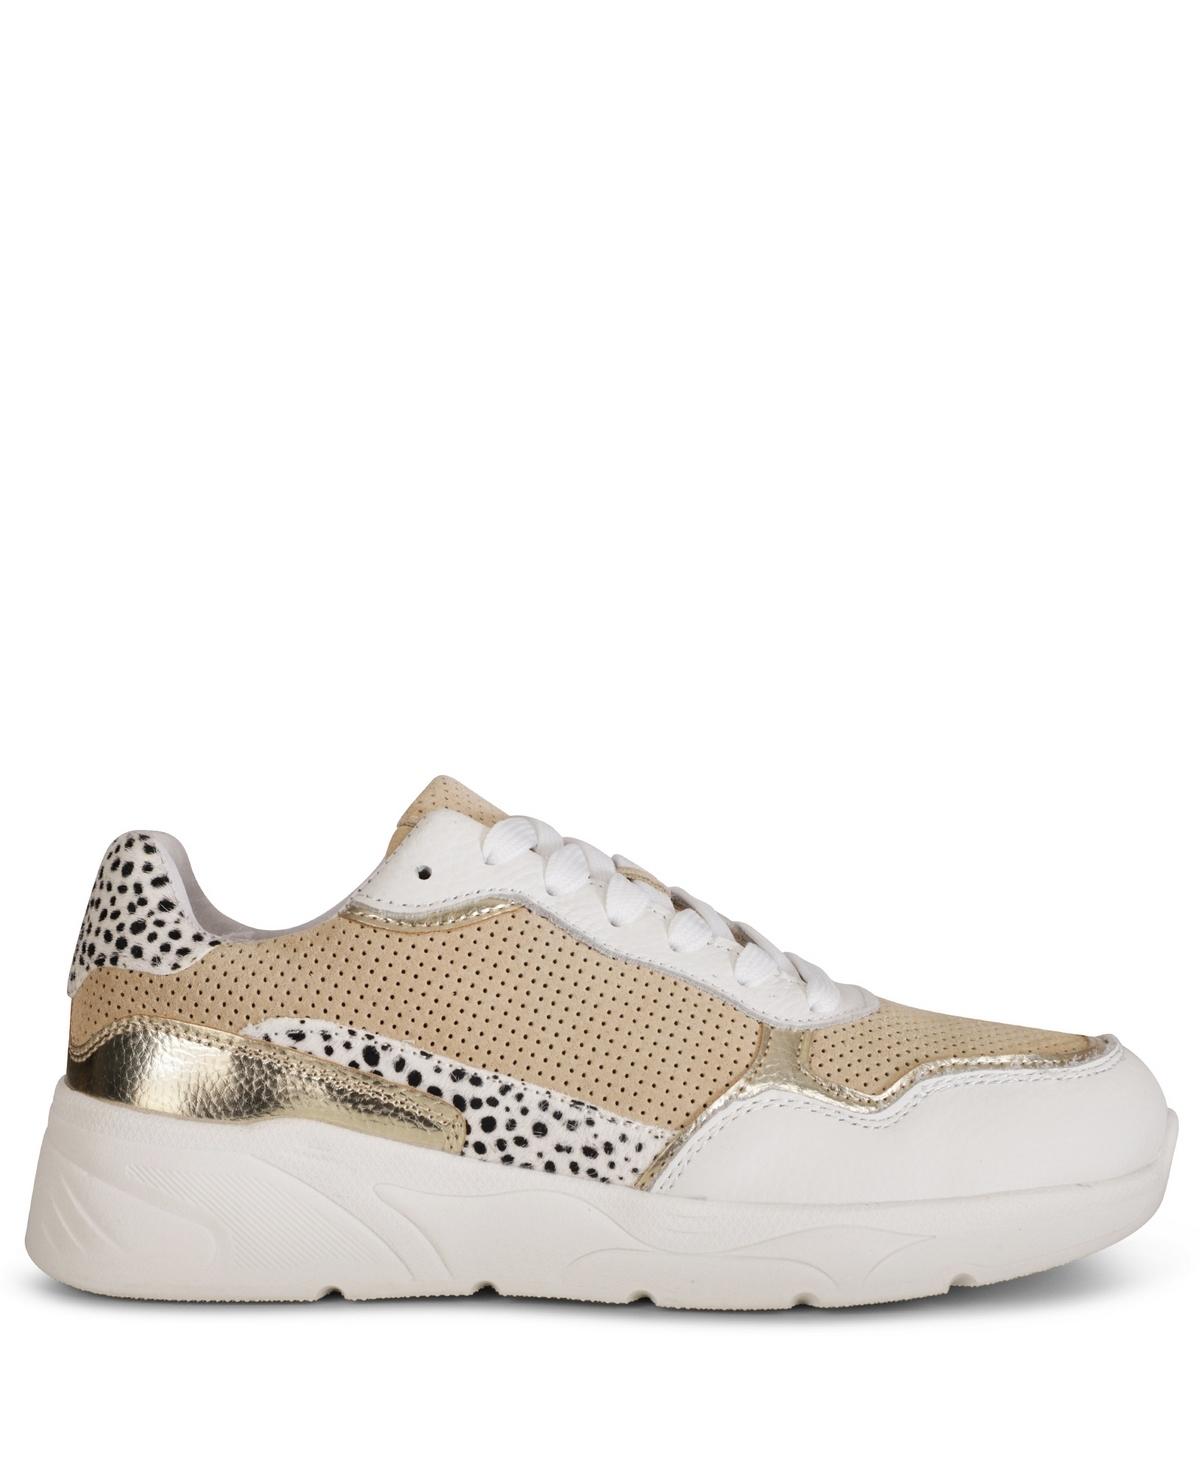 Shoecolate Sneaker Dierenprint 8.10.06.023